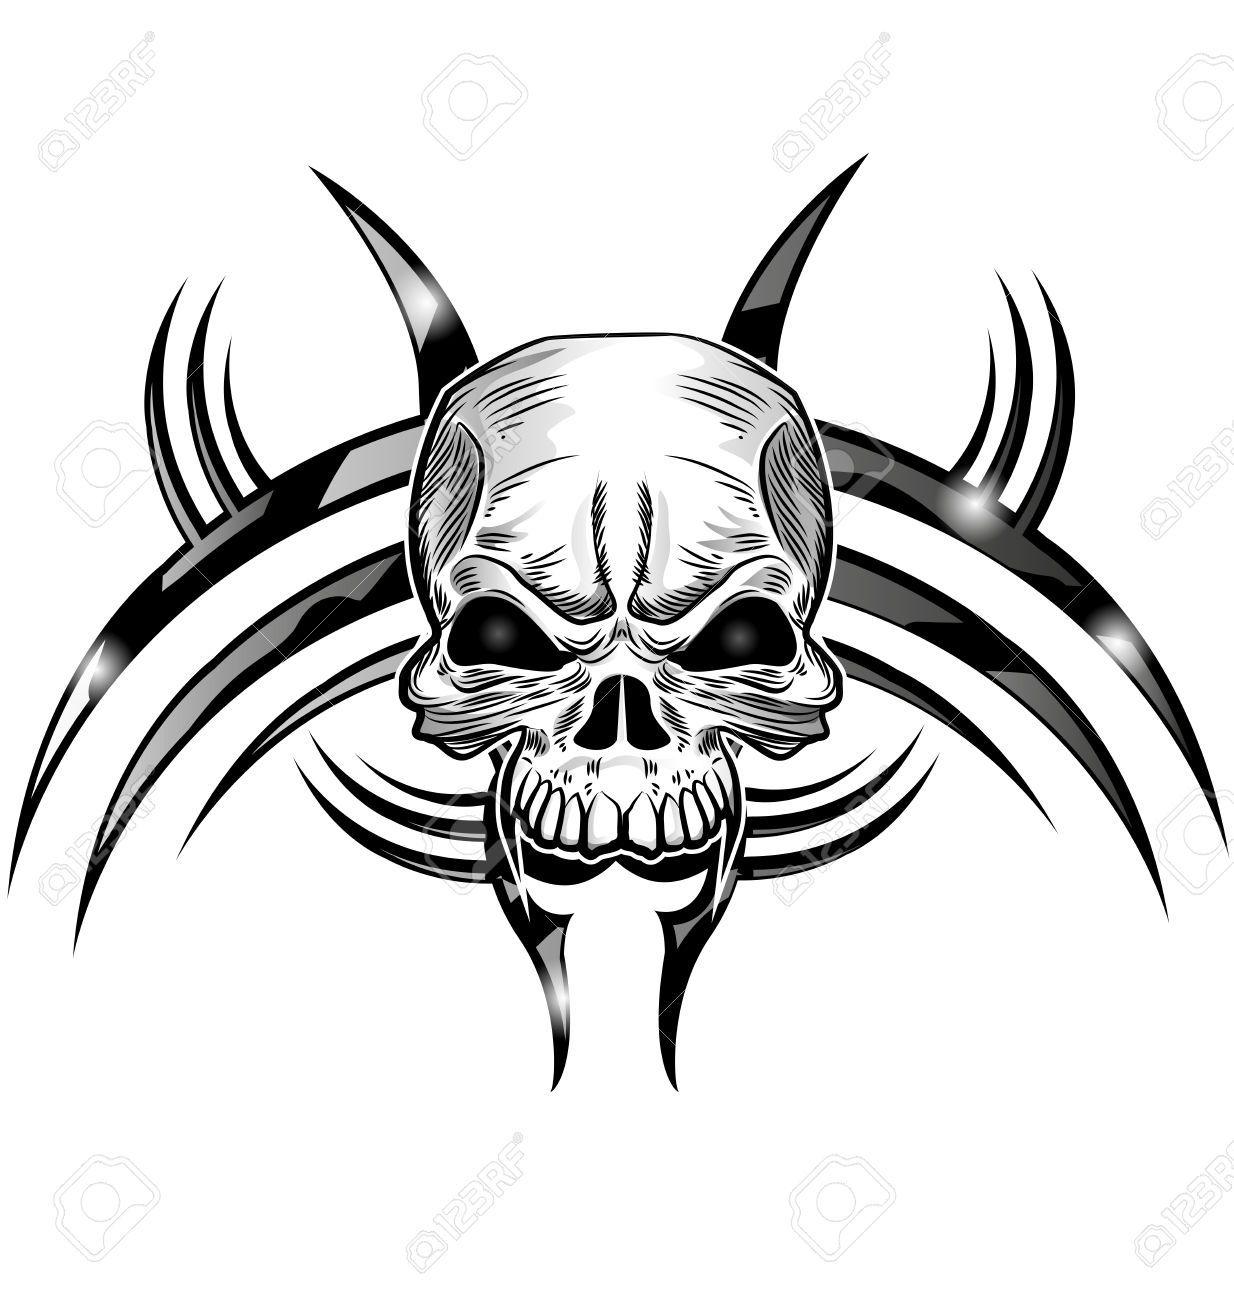 skull tattoo designs free images for tatouage. Black Bedroom Furniture Sets. Home Design Ideas